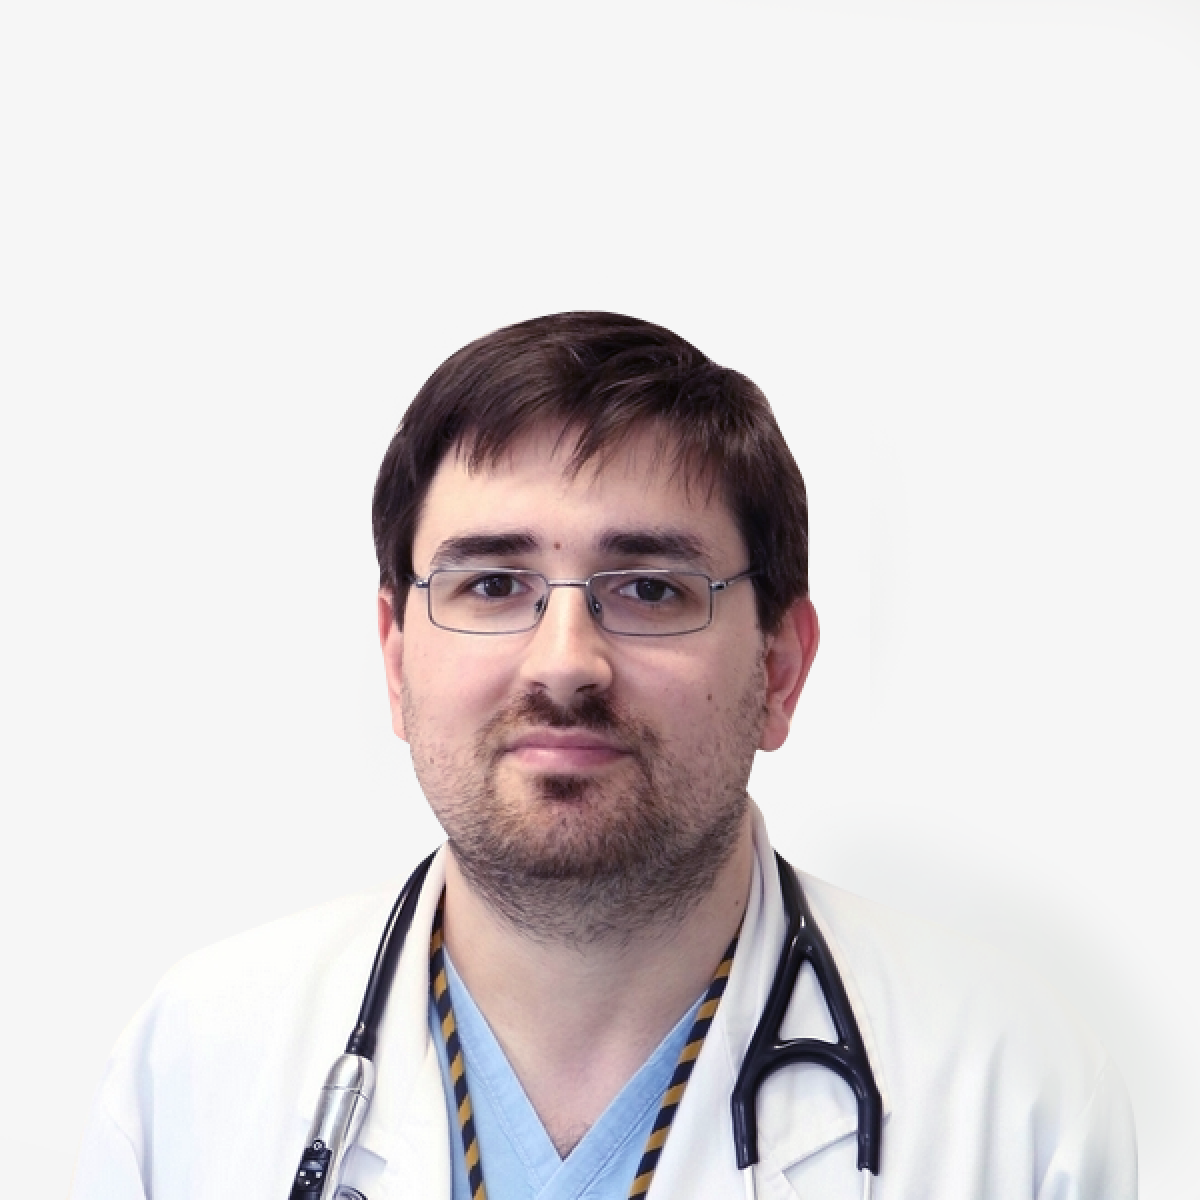 Dr. Sérgio Laranjo